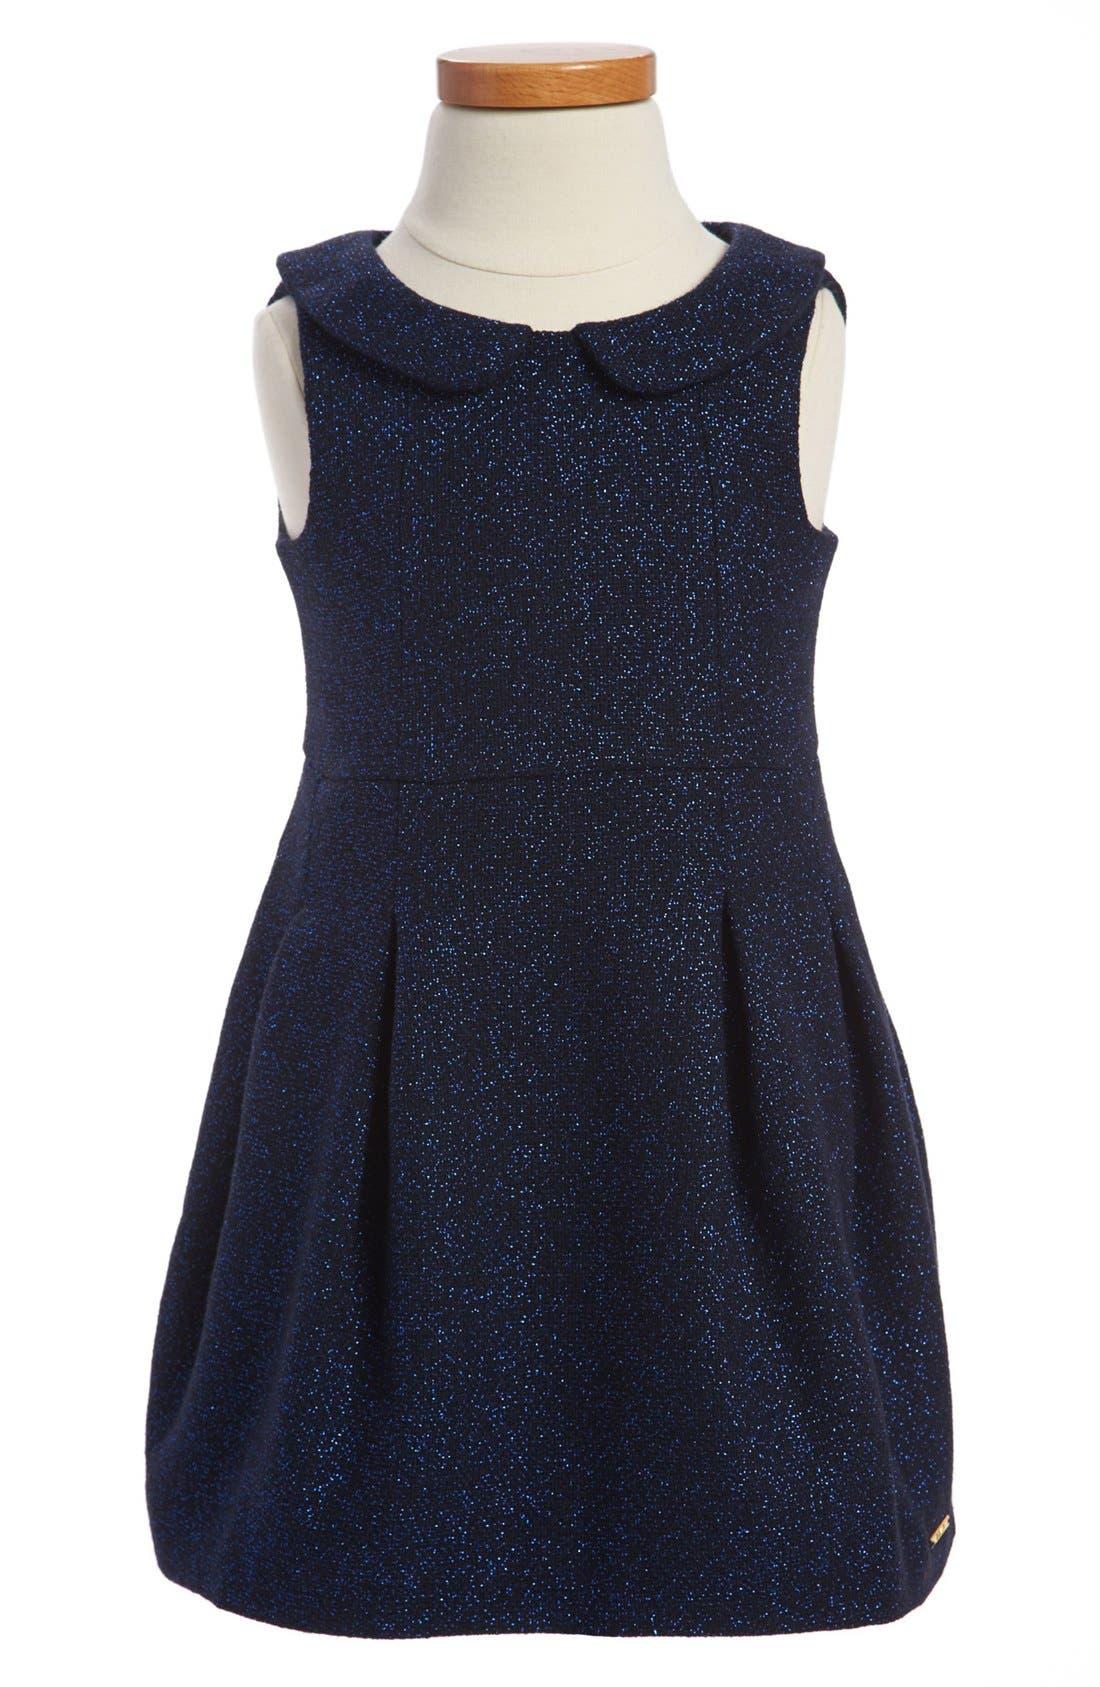 Main Image - LITTLE MARC JACOBS Sleeveless Dress (Toddler Girls)